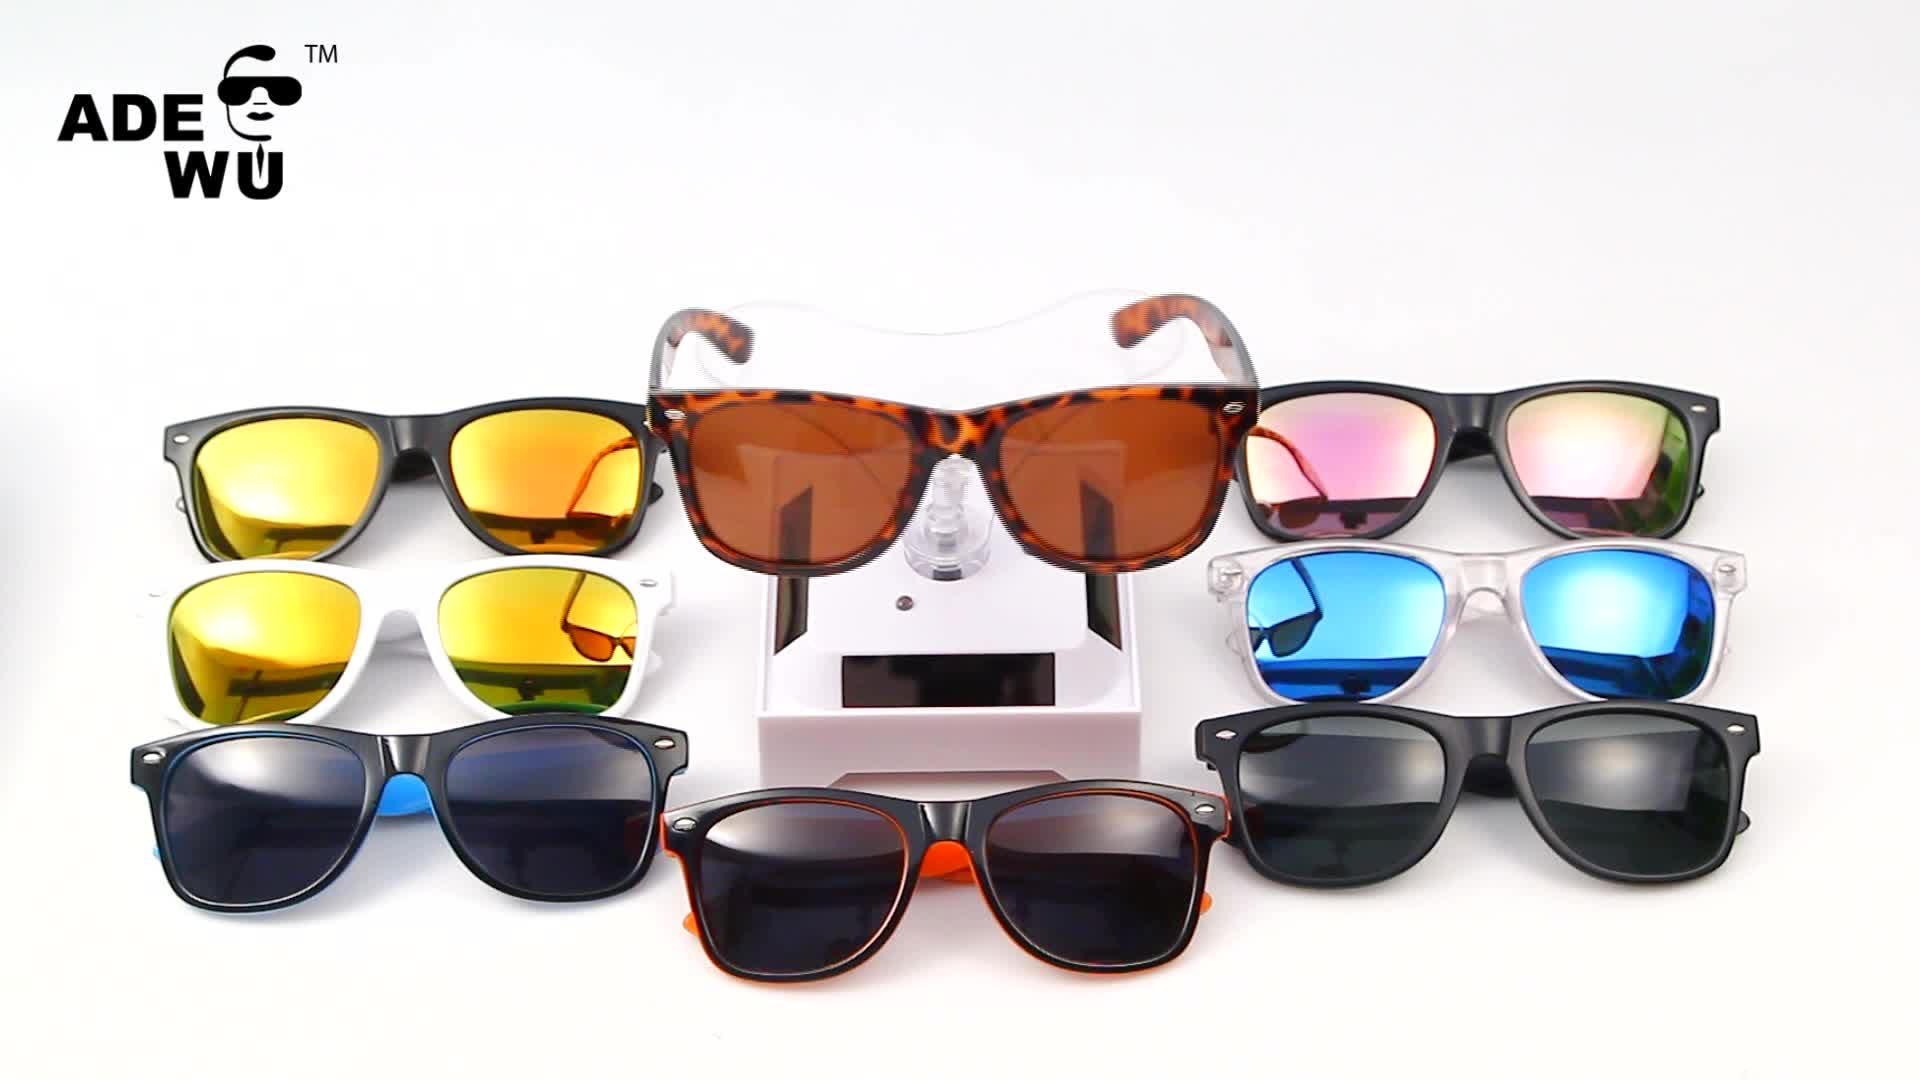 ADE WU 2017 gafas de sol cheap promotion polarized mirrored sunglasses replica offer private label sunglasses brand your own